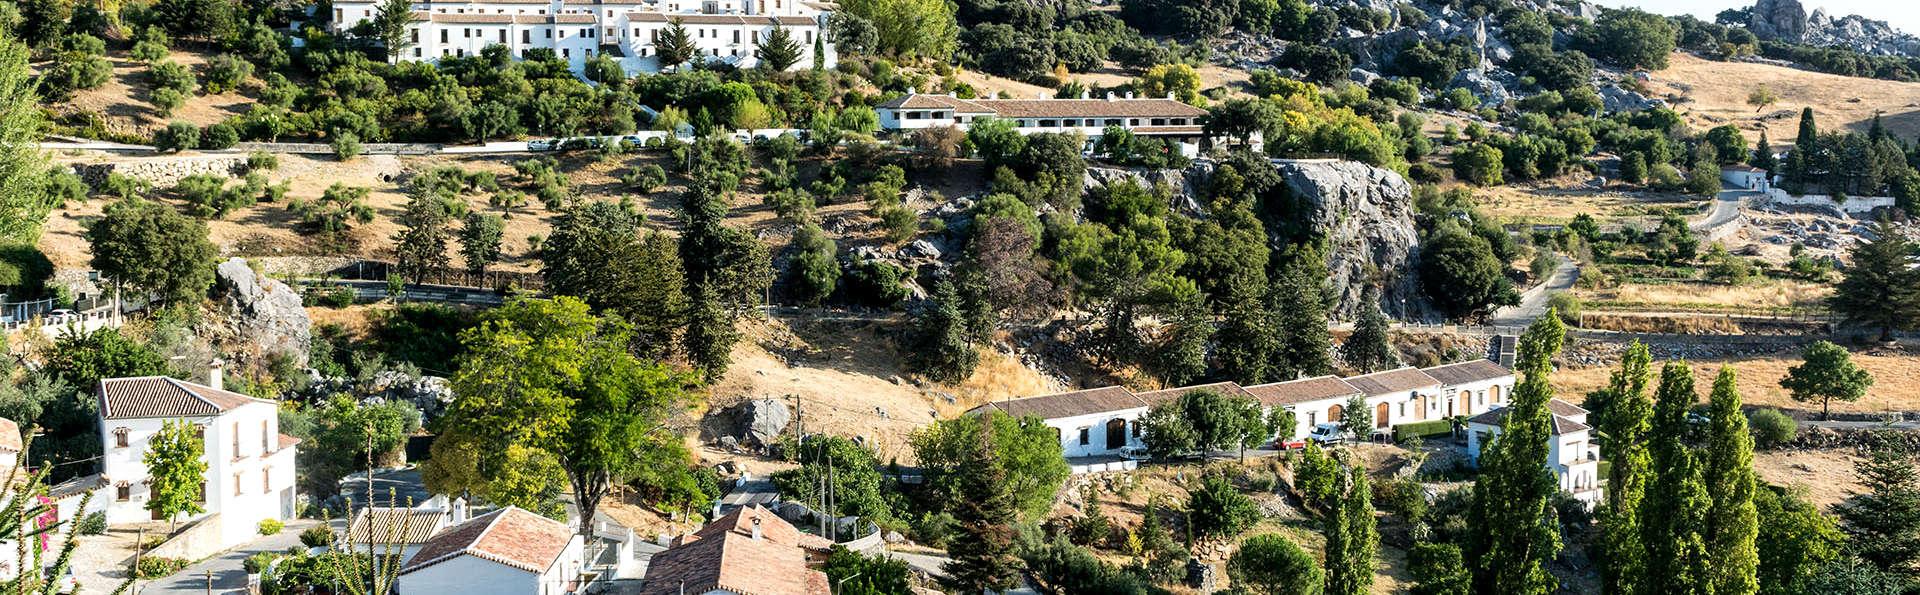 Hotel Villa de Grazalema - EDIT_NEW_VIEW.jpg